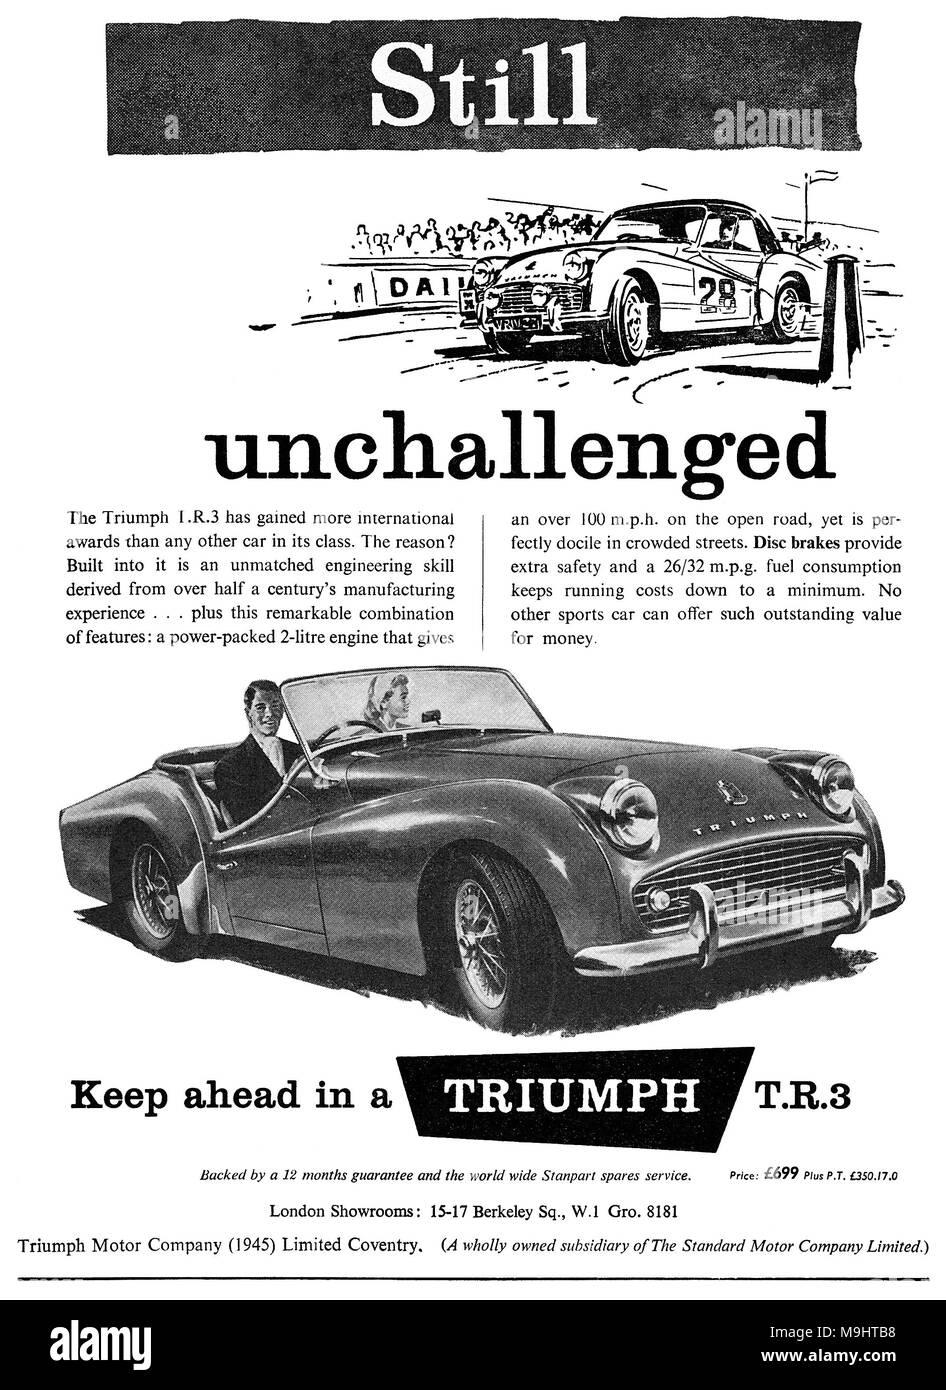 Car Advertising 1950s Stock Photos & Car Advertising 1950s Stock ...